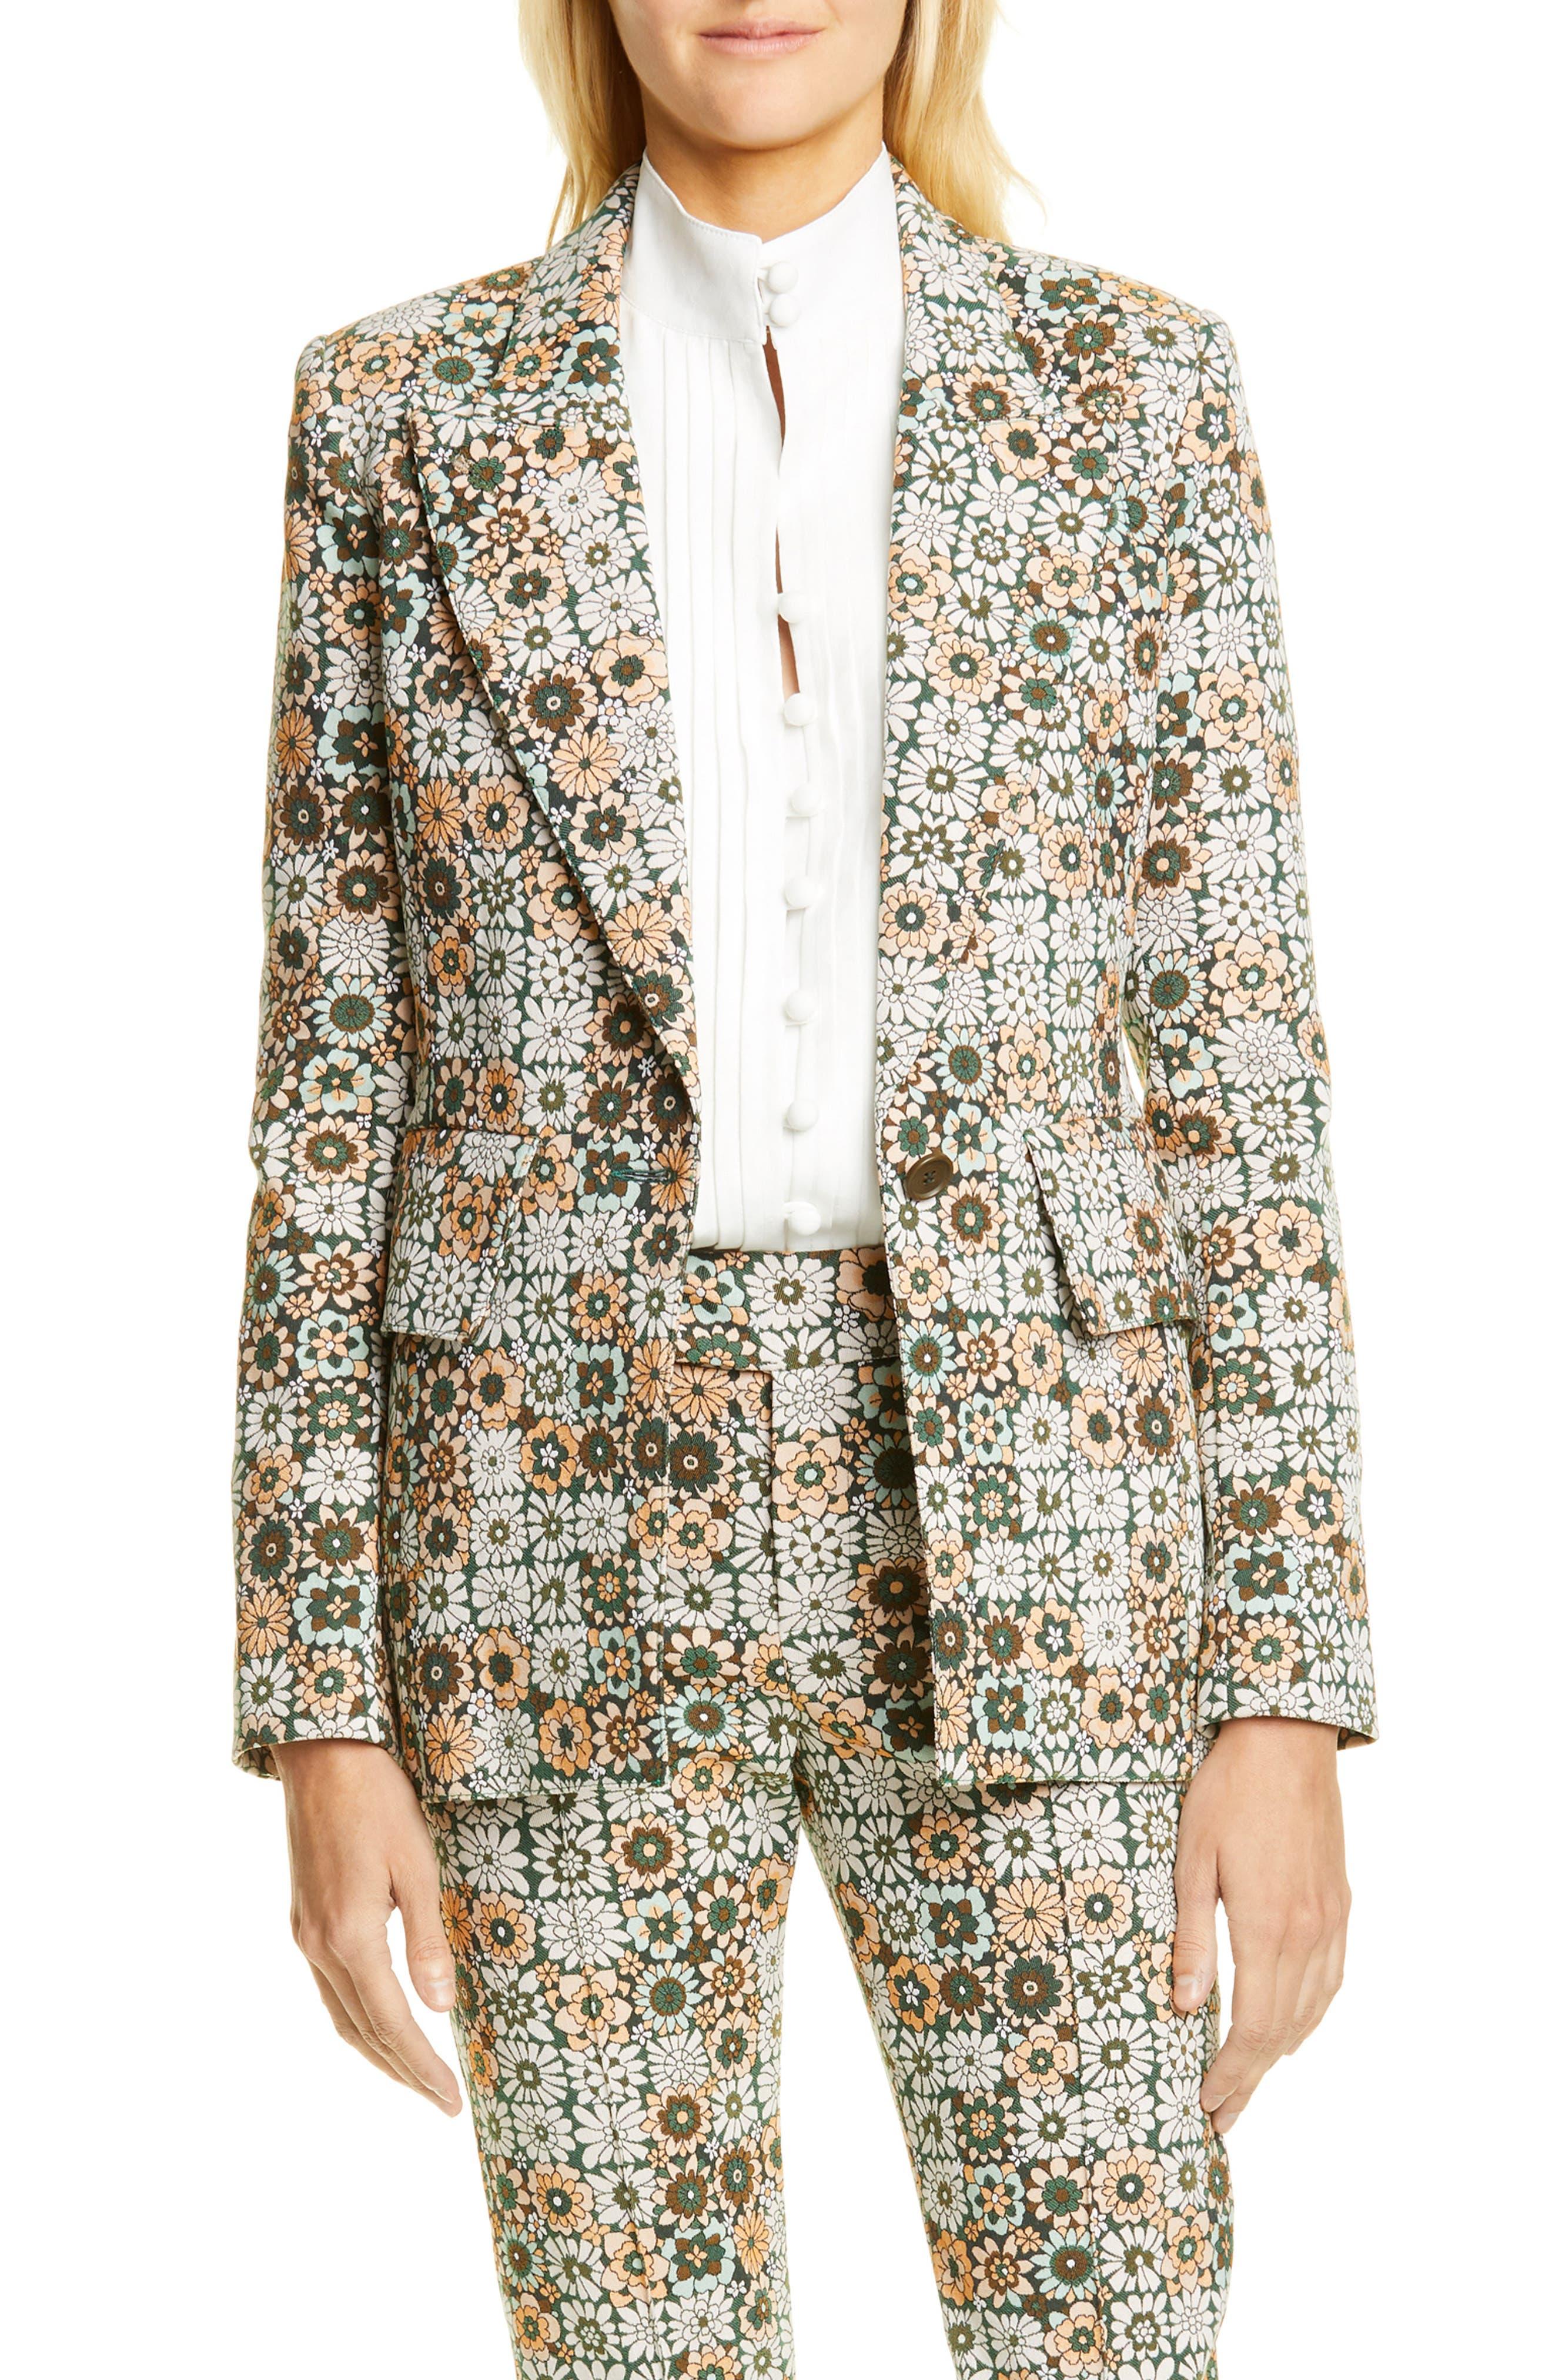 1960s Coats and Jackets Womens Smythe Lounge Blazer $795.00 AT vintagedancer.com